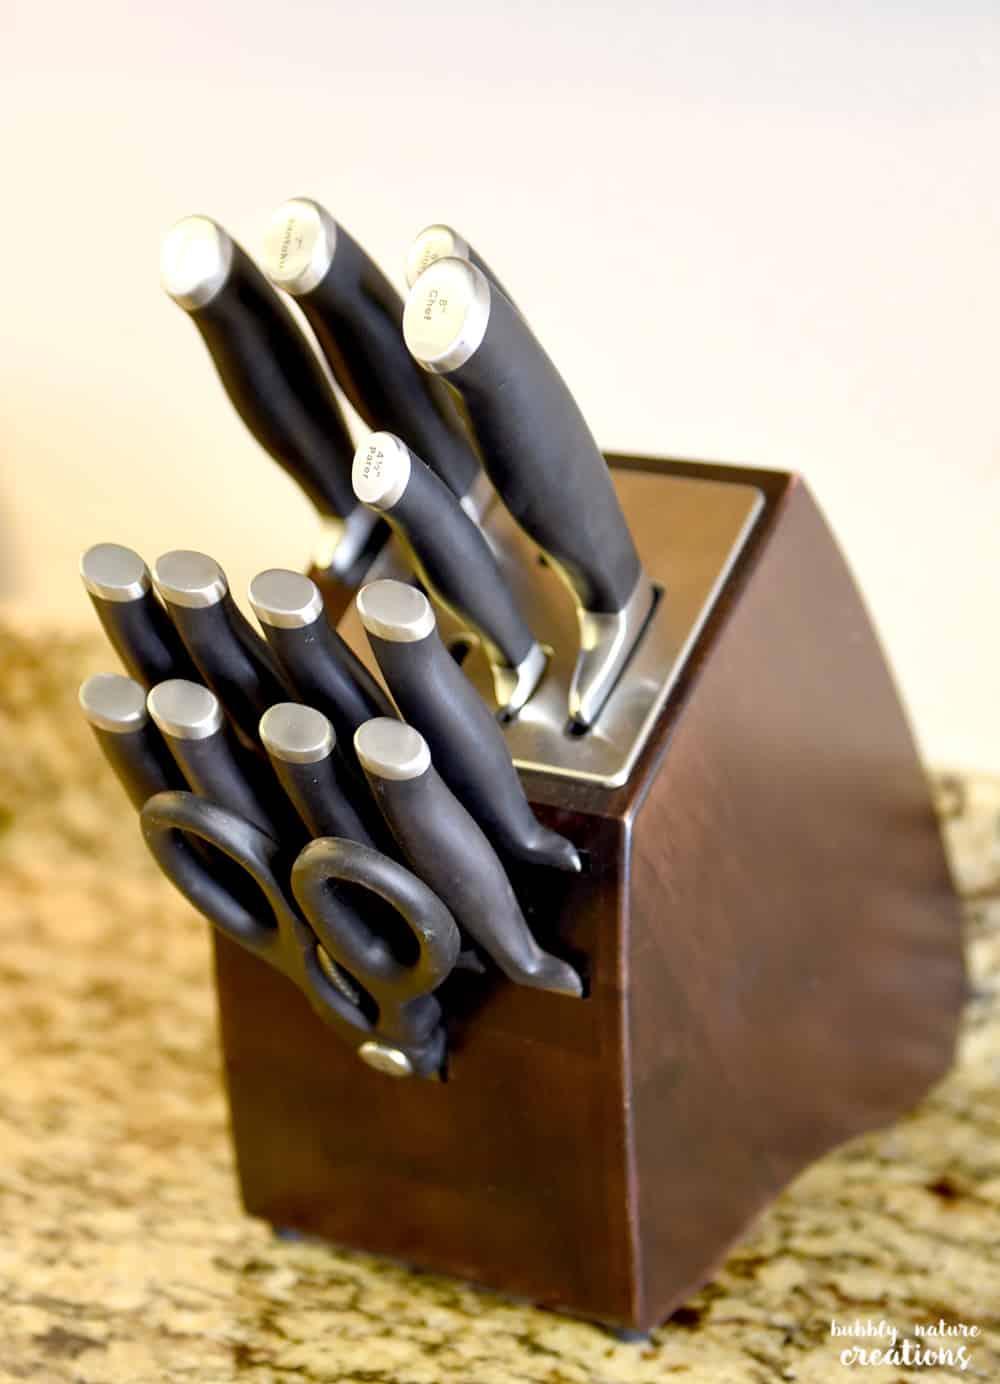 calphalon 15 piece knife set